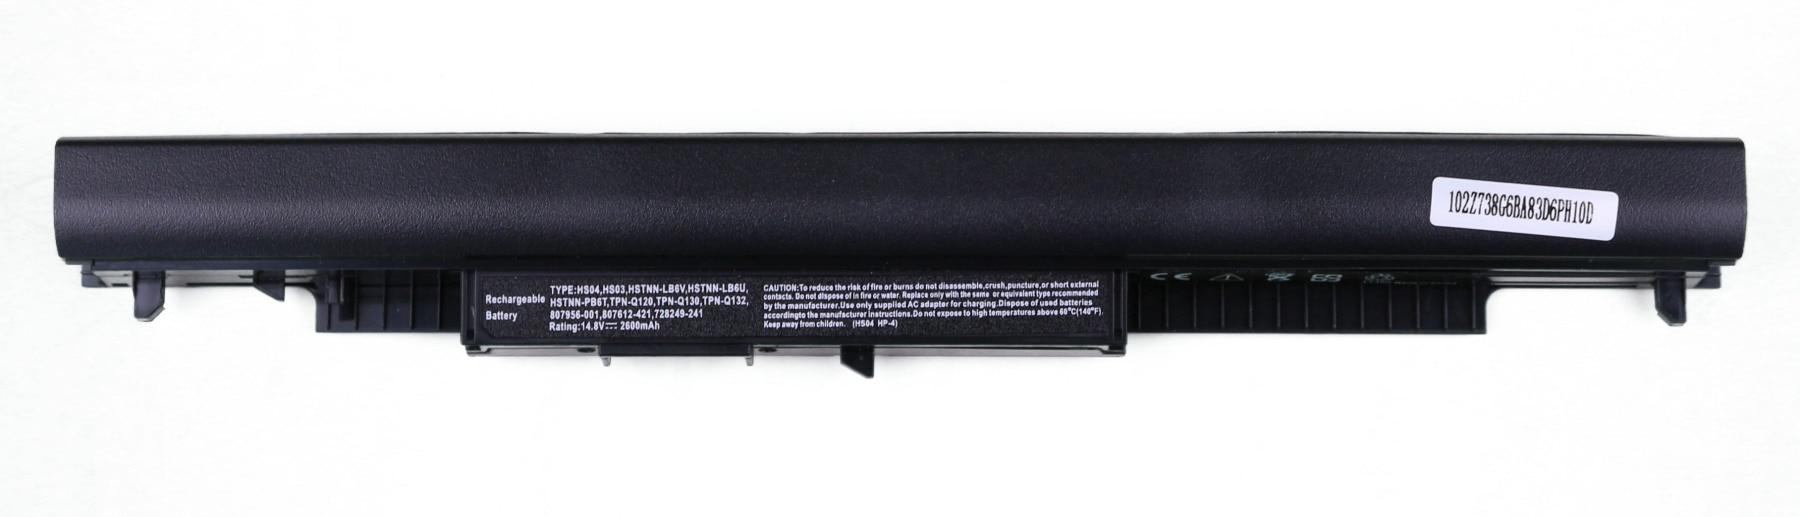 Аккумулятор HSTNN DB7J (батарея)|Аккумуляторы для ноутбуков|   | АлиЭкспресс